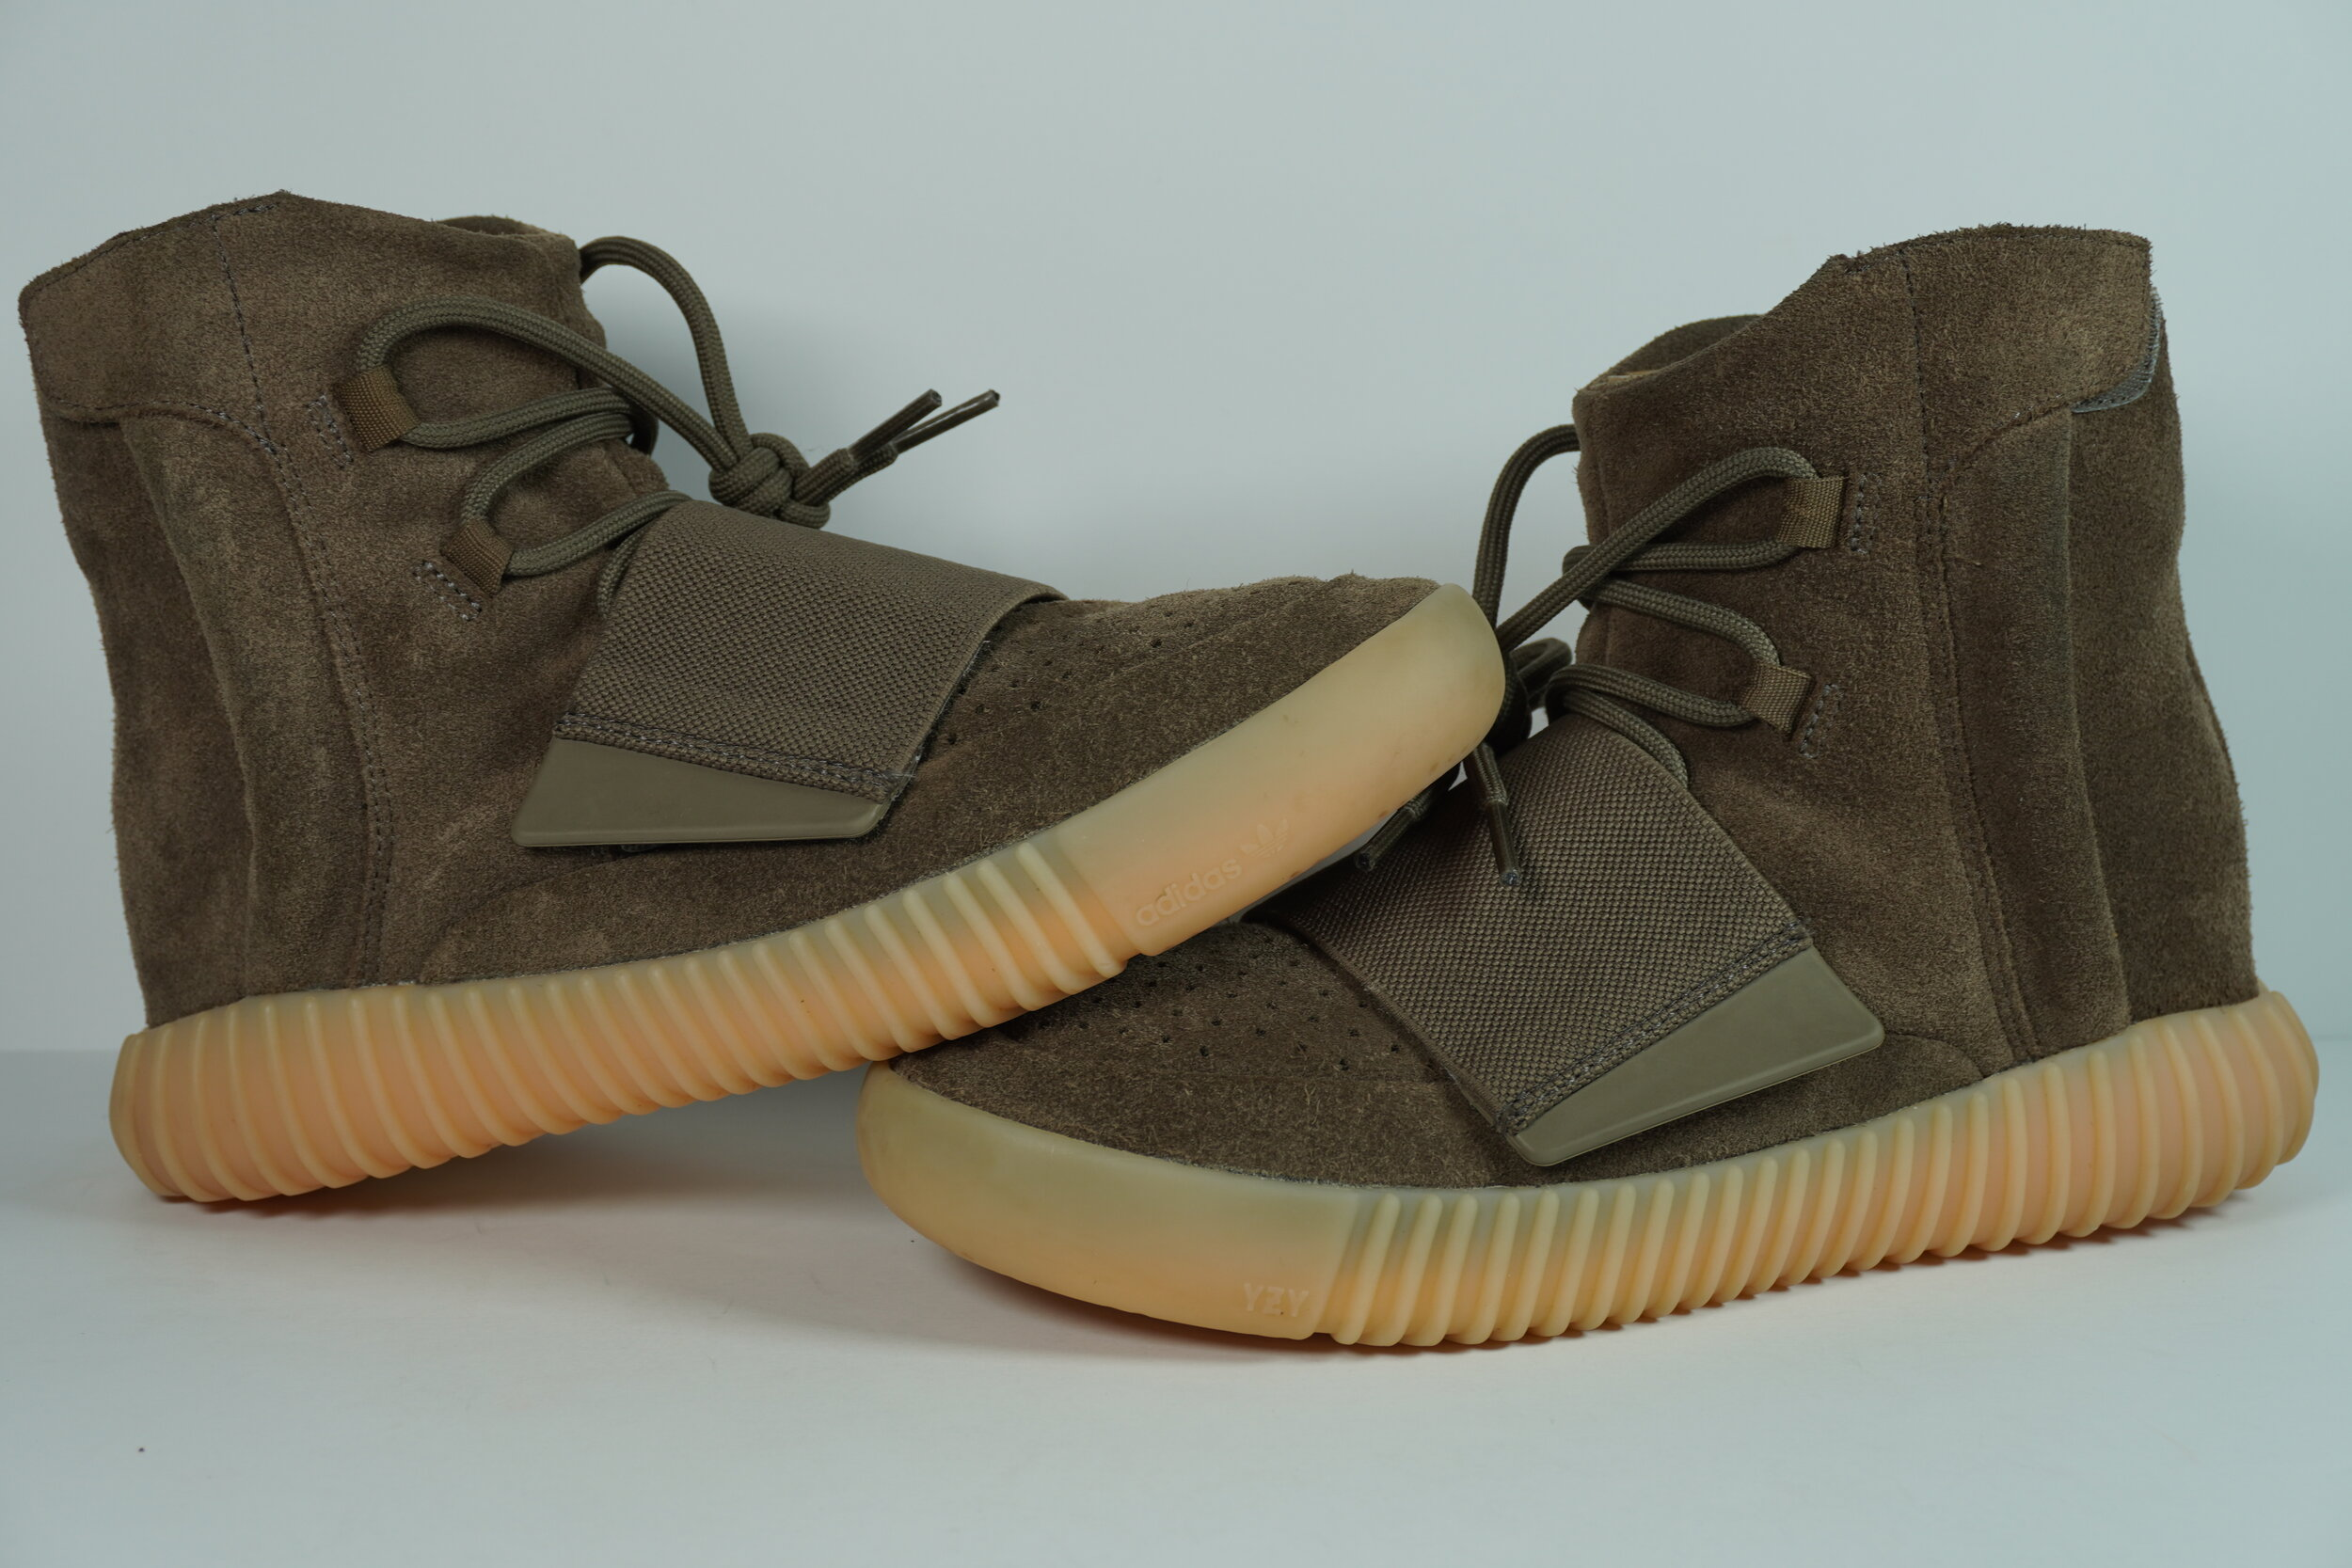 adidas yeezy size 6